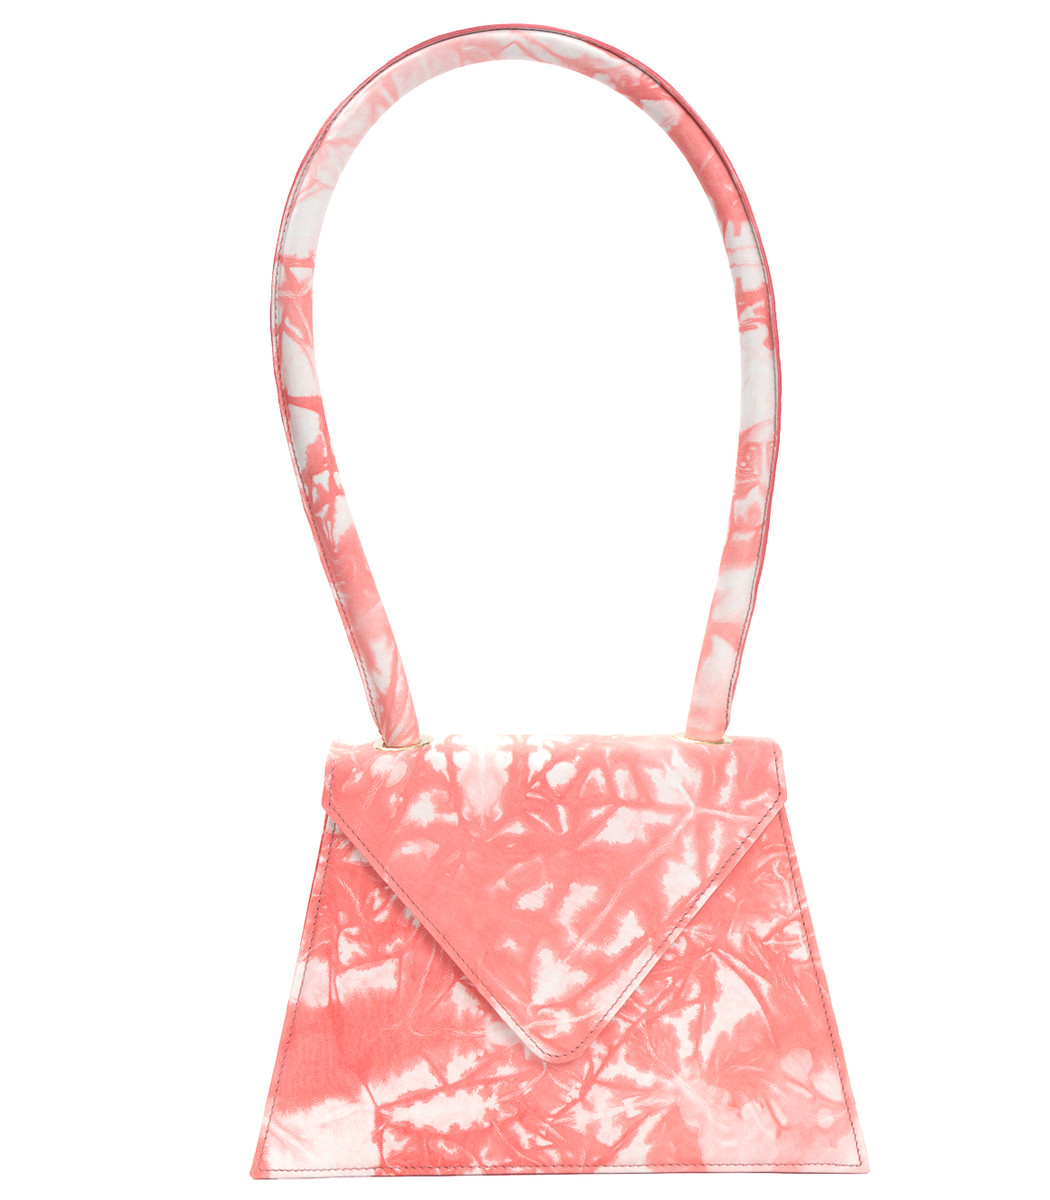 AMÉLIE PICHARD Pink & White Flat Tie Dye Bag in Multicolor